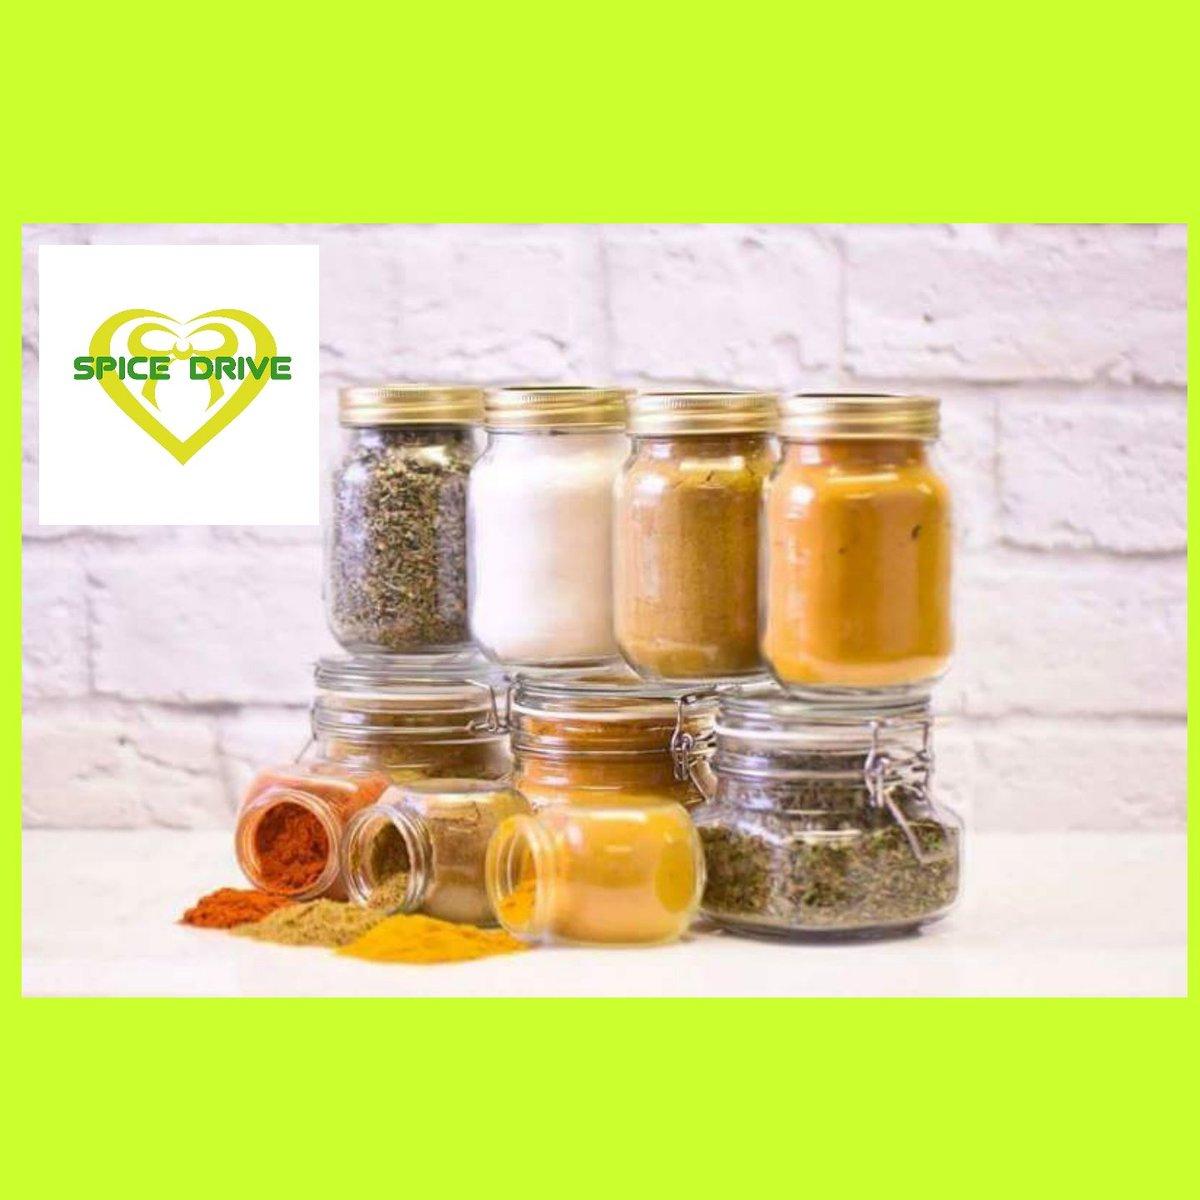 Fulfill your #pantrygoals with our #organicspices   #FlockBN #londonislovingit #dbfy #ATSocialMedia #UKBIZHOUR #EnglandHour #shoutout #rt<br>http://pic.twitter.com/3EOGhWVk0u